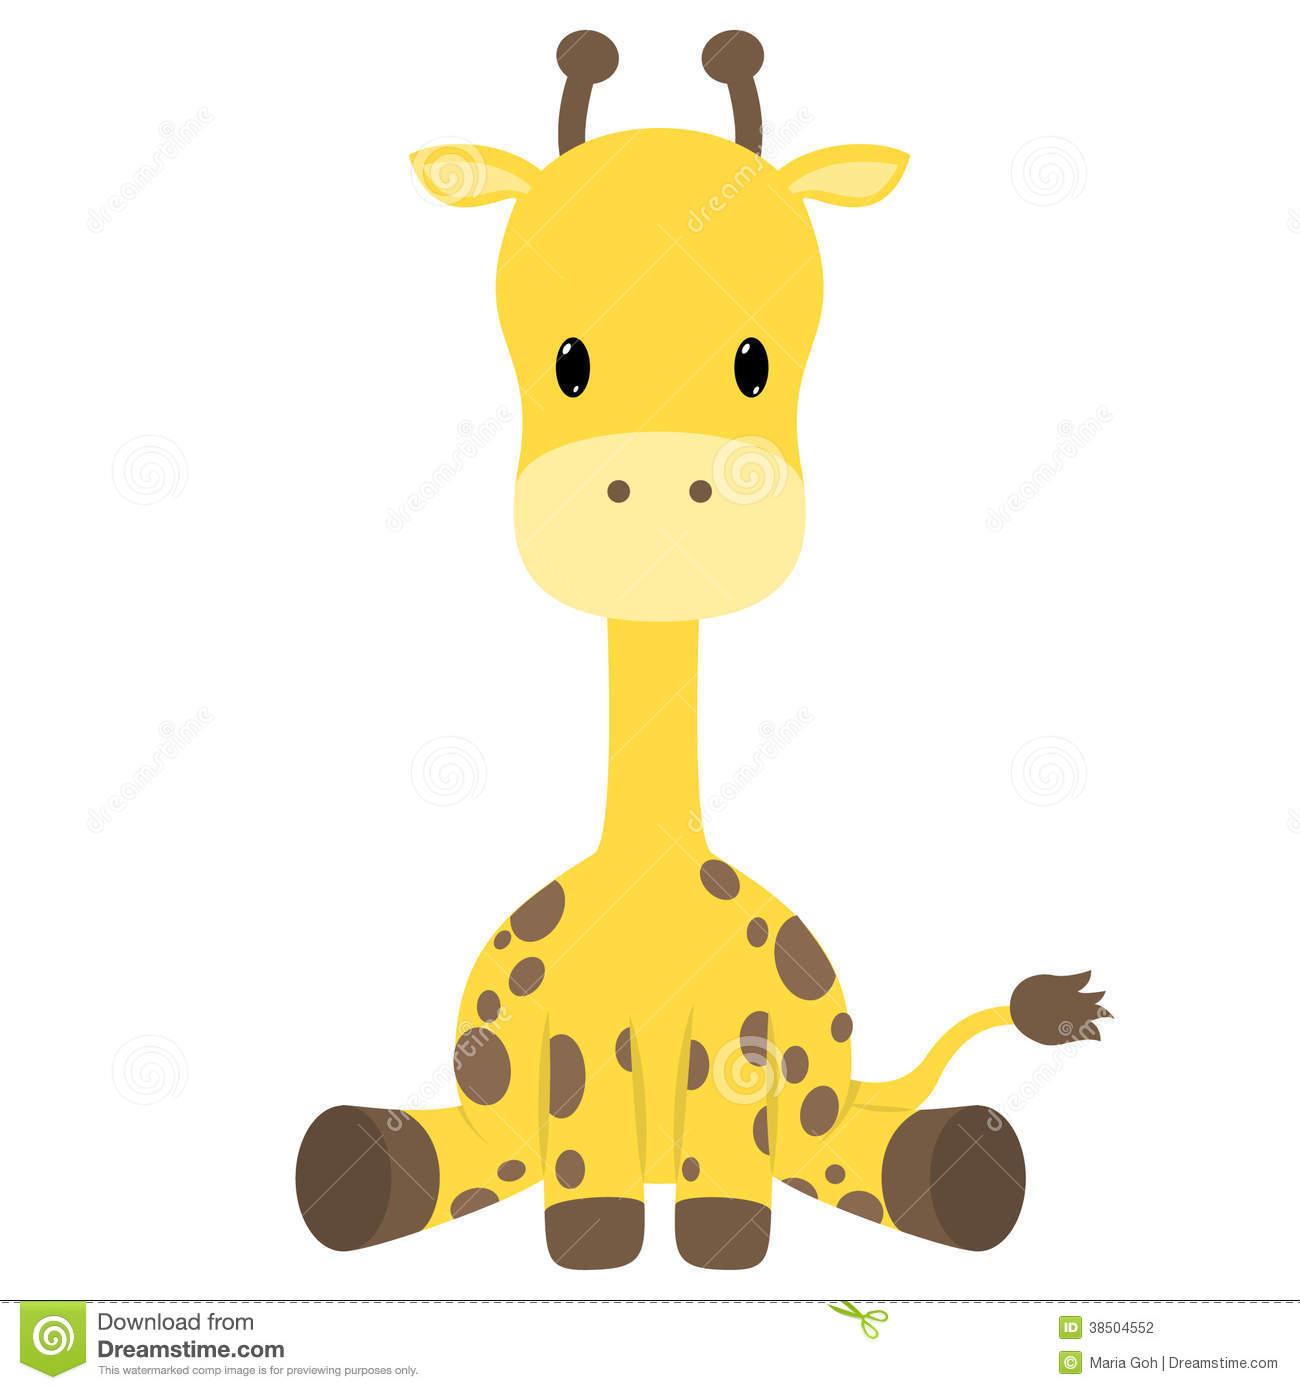 630 Baby Giraffe free clipart.